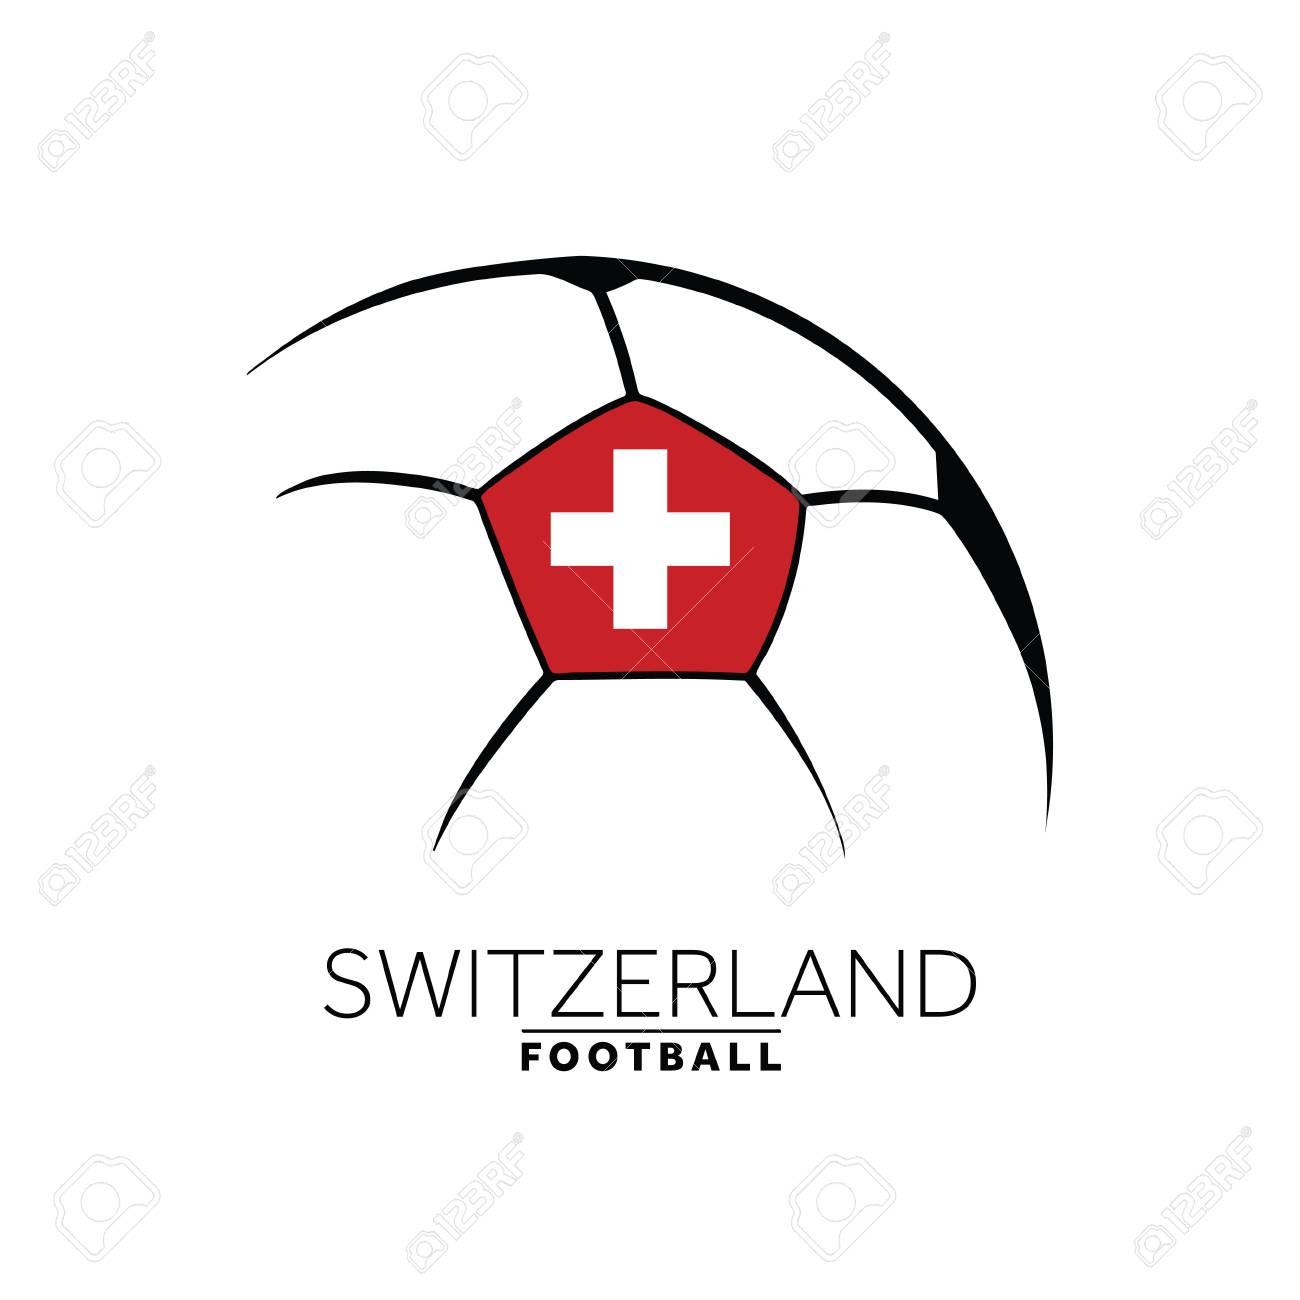 soccer football minimal design with switzerland flag royalty free Switzerland Chocolate soccer football minimal design with switzerland flag stock vector 99155928